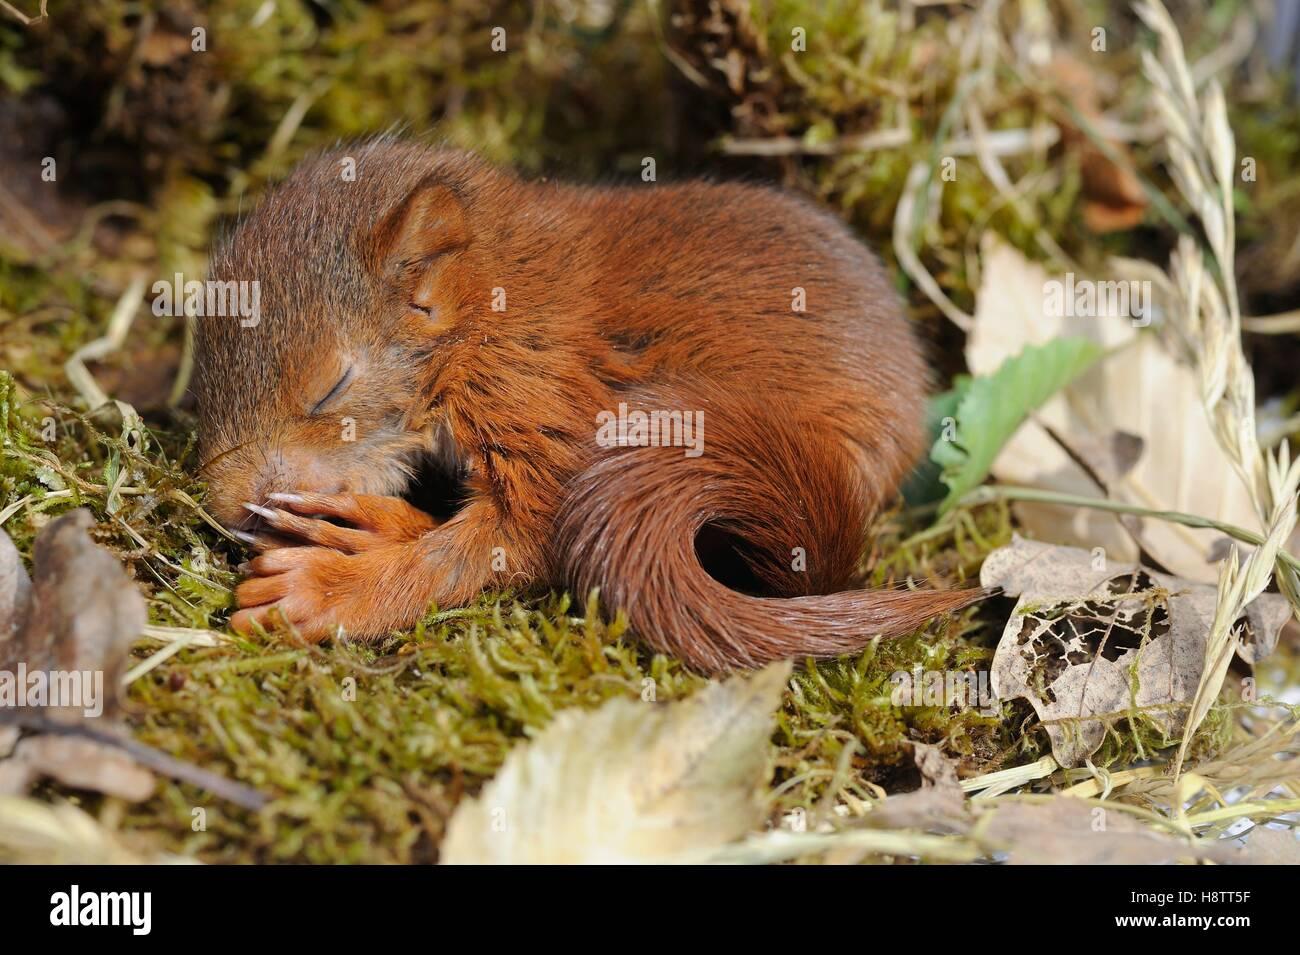 squirrel sleeping stockfotos squirrel sleeping bilder seite 2 alamy. Black Bedroom Furniture Sets. Home Design Ideas